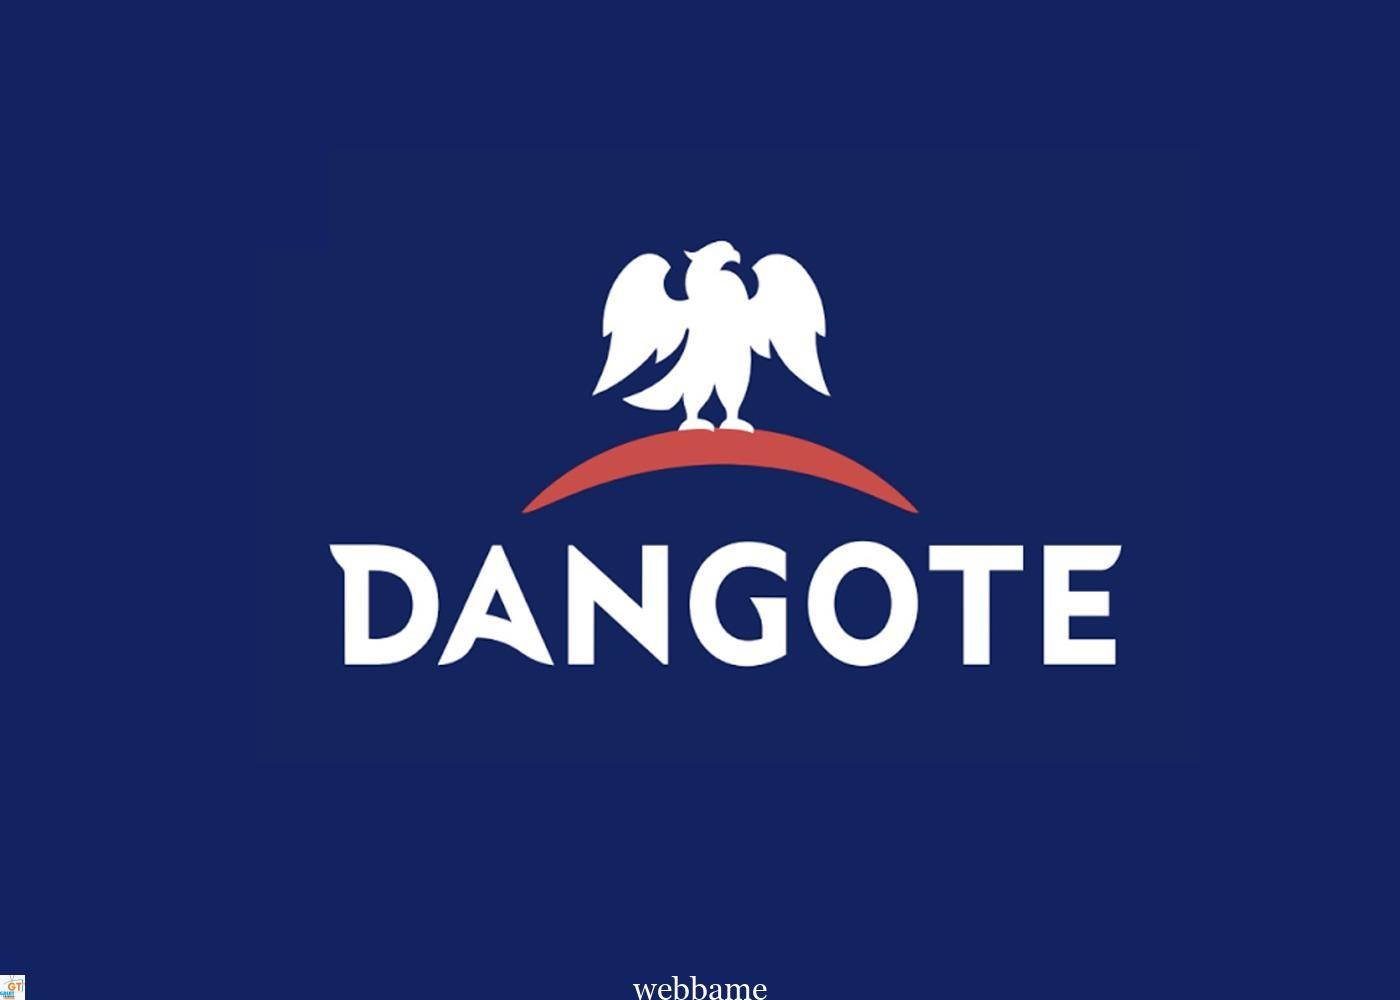 DANGOTE LOGO,GATEWAY TRADE FAIR: DANGOTE READY TO BOOST AGRIC ACTIVITIES THROUGH STARTEGIC INVESTMENTS